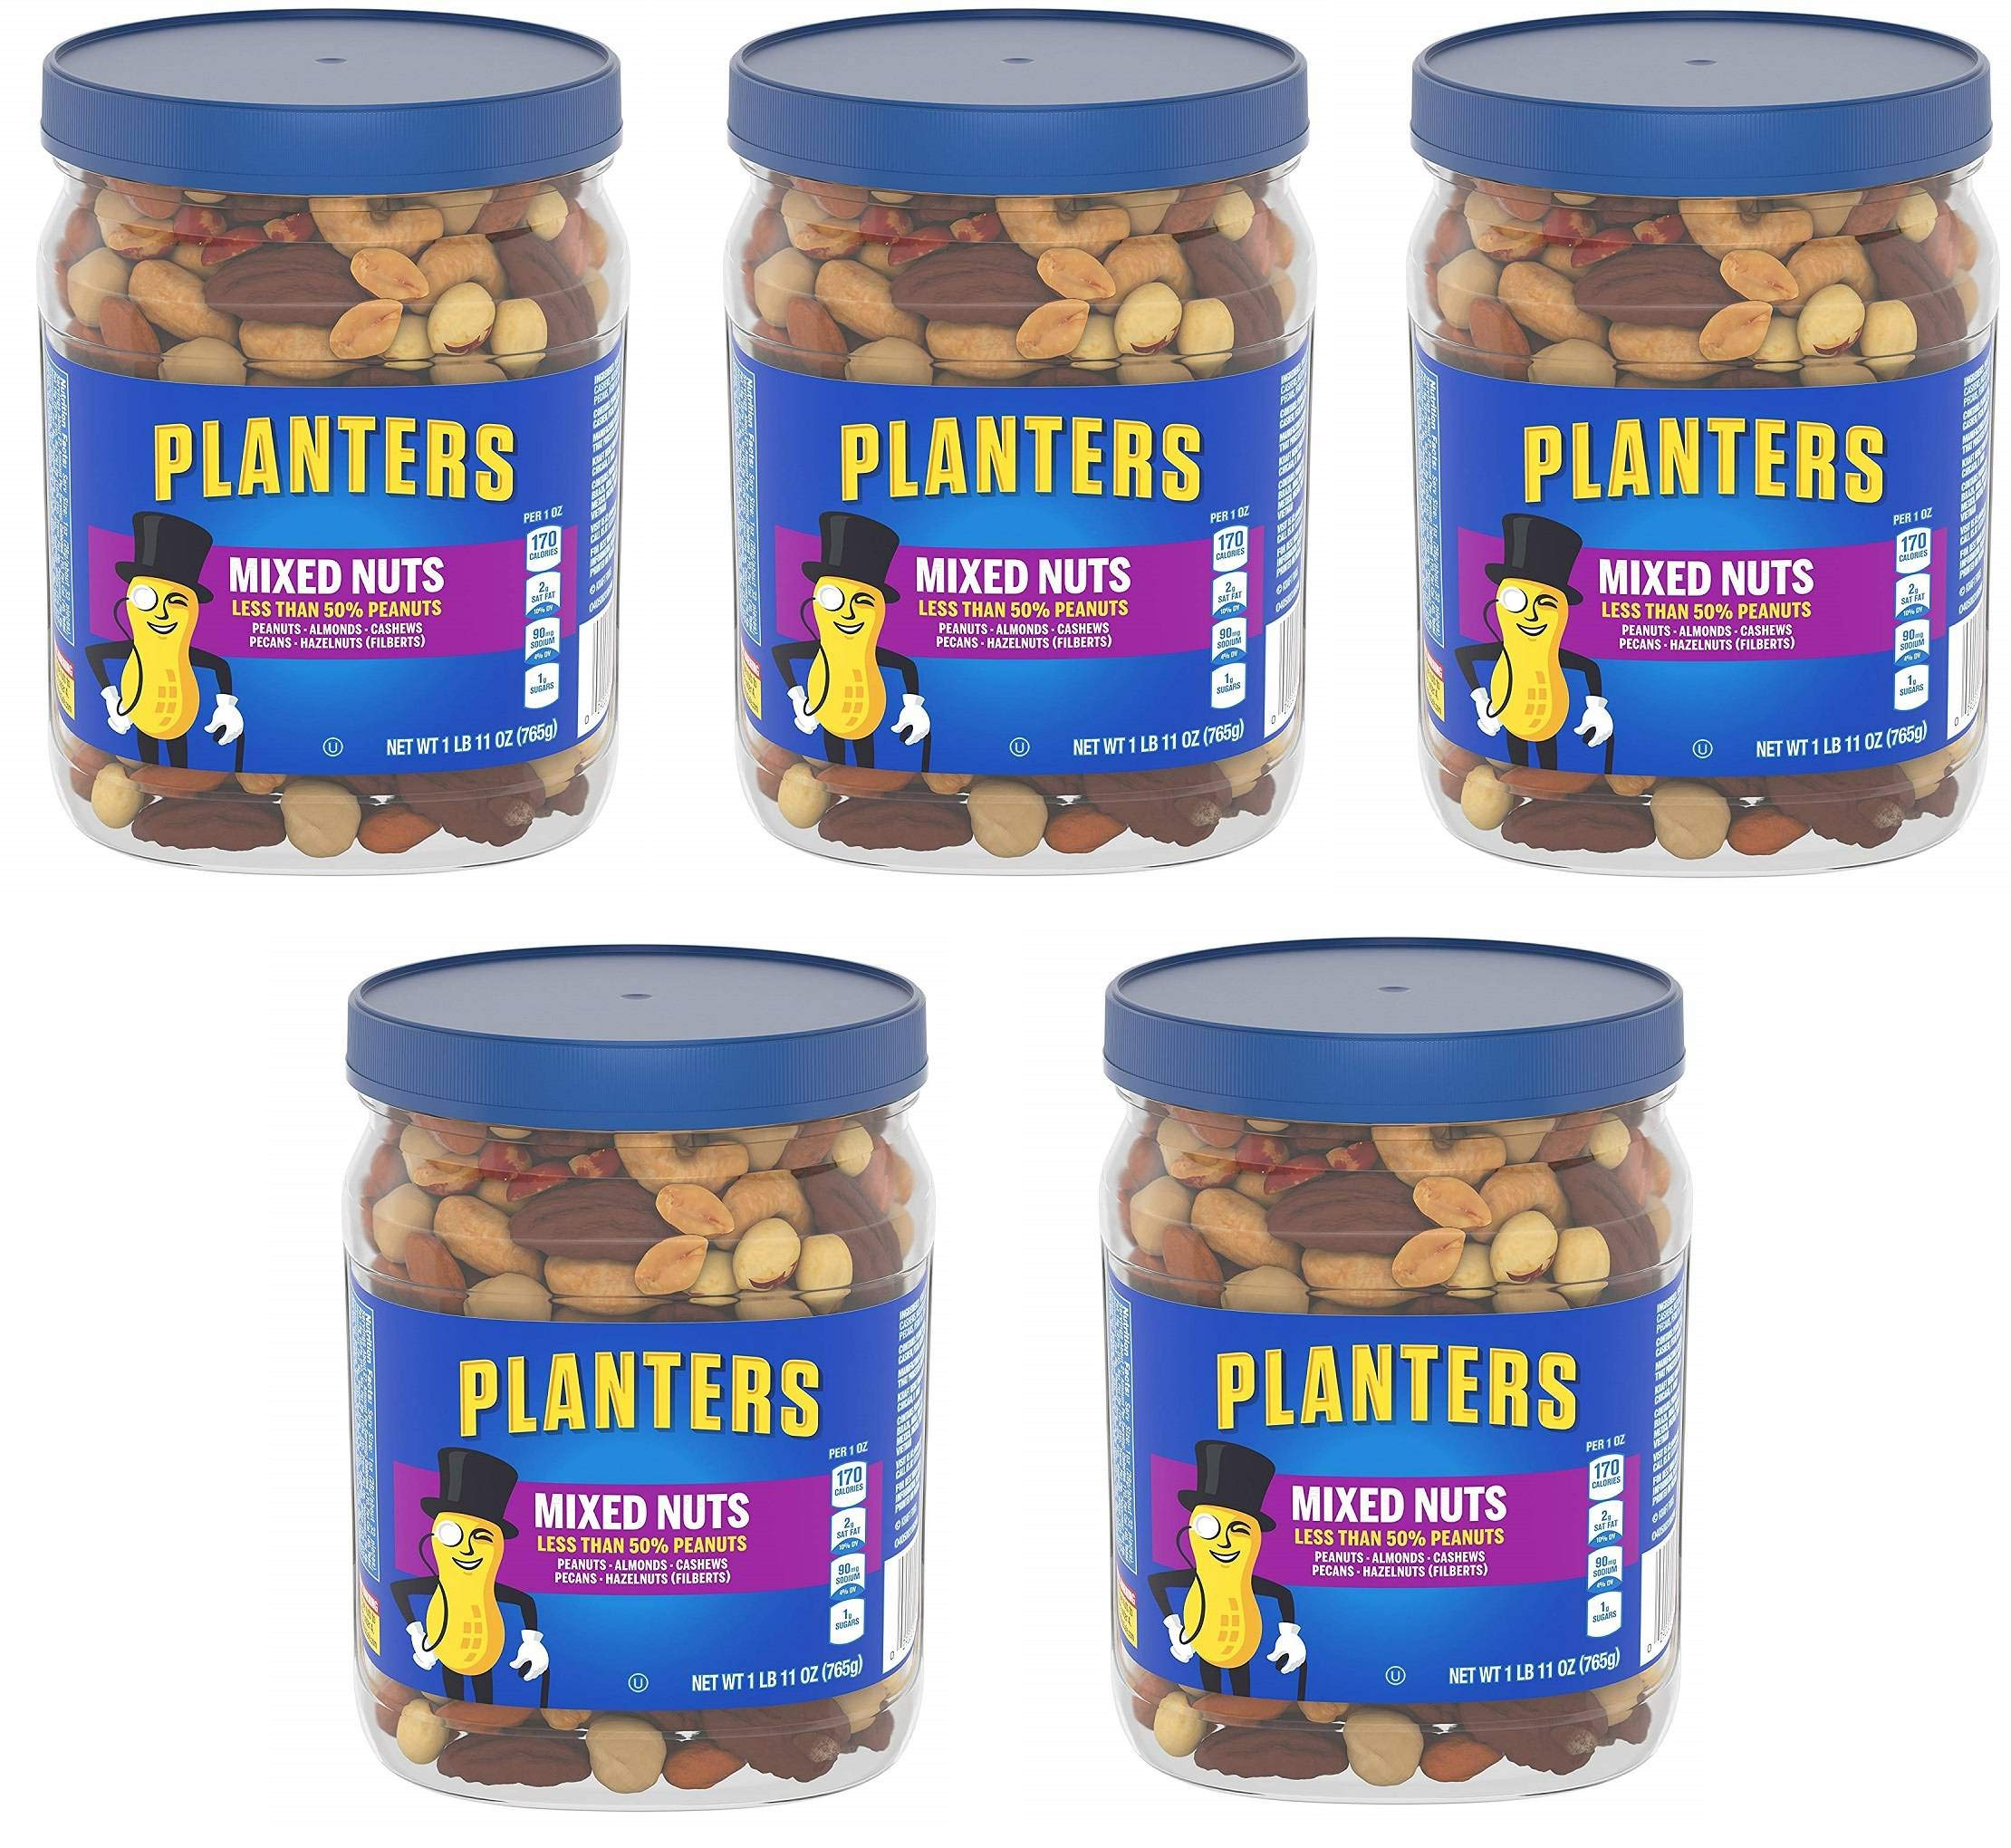 Planters Mixed Nuts, Regular Mixed Nuts, 5 Tubs